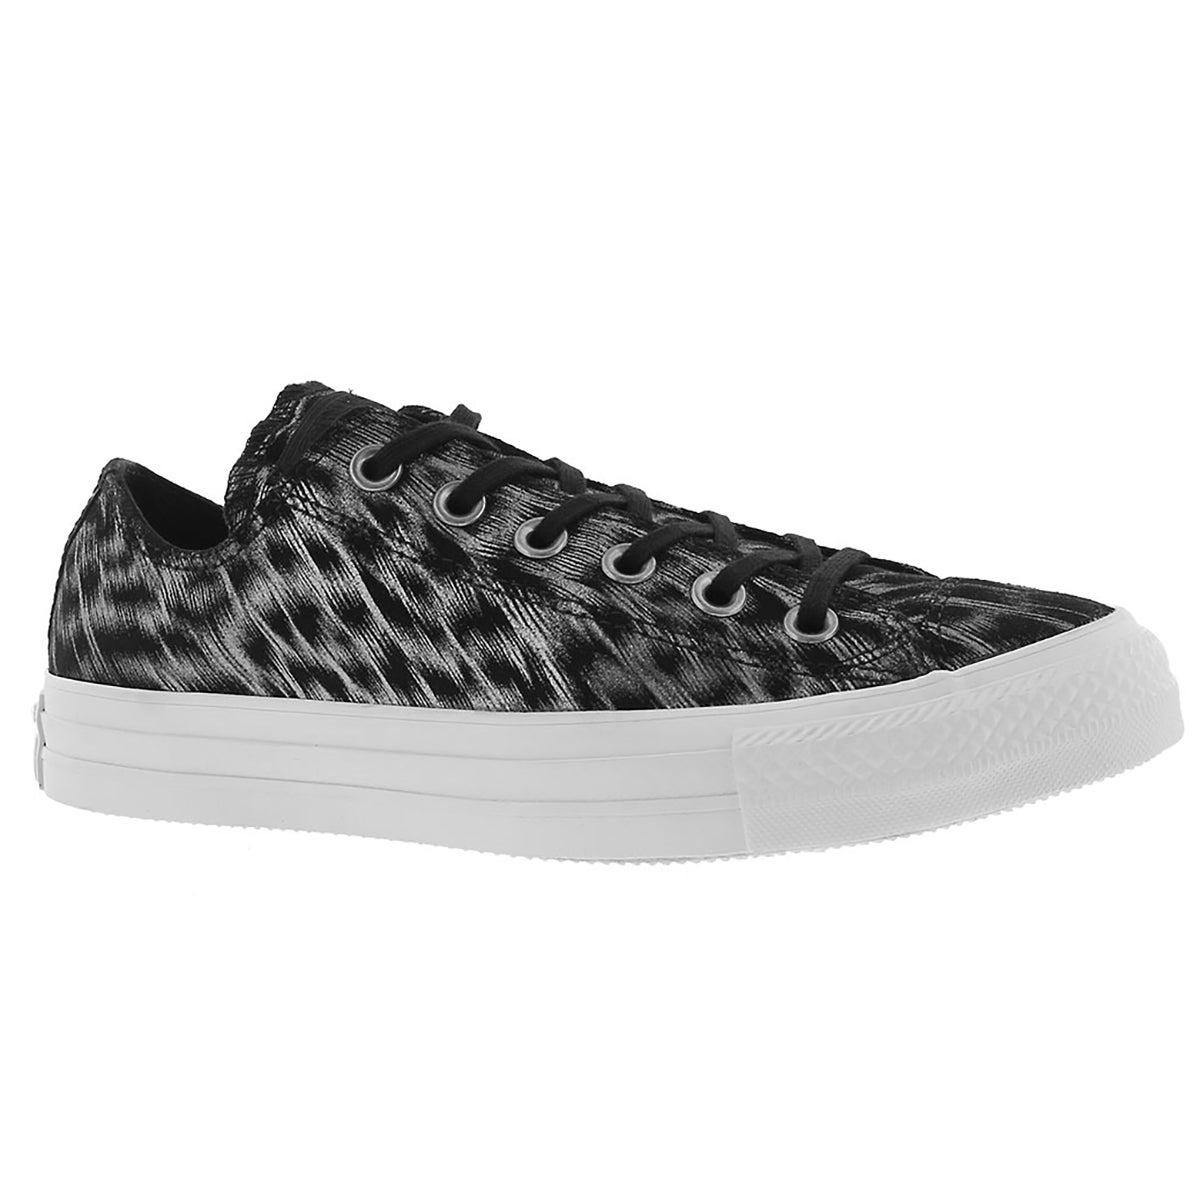 Women's CT ALL STAR ANIMAL print black sneakers